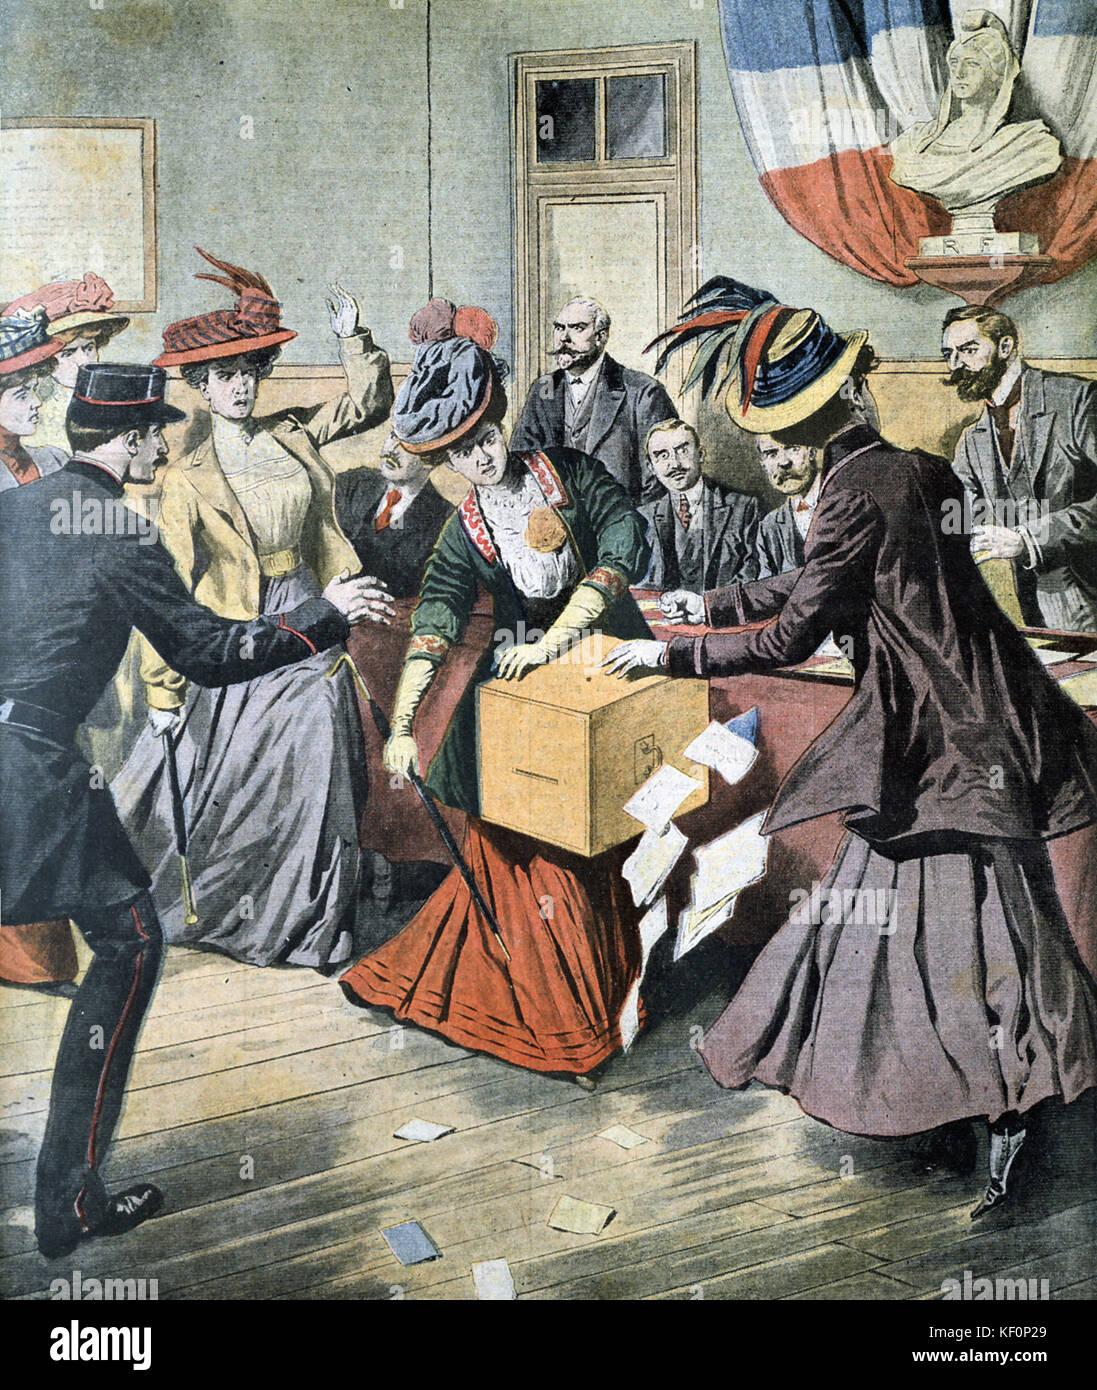 Belgian Suffragettes upsetting ballot boxes  'Le Petit Journal'  Paris, 17 May 1908 - Stock Image